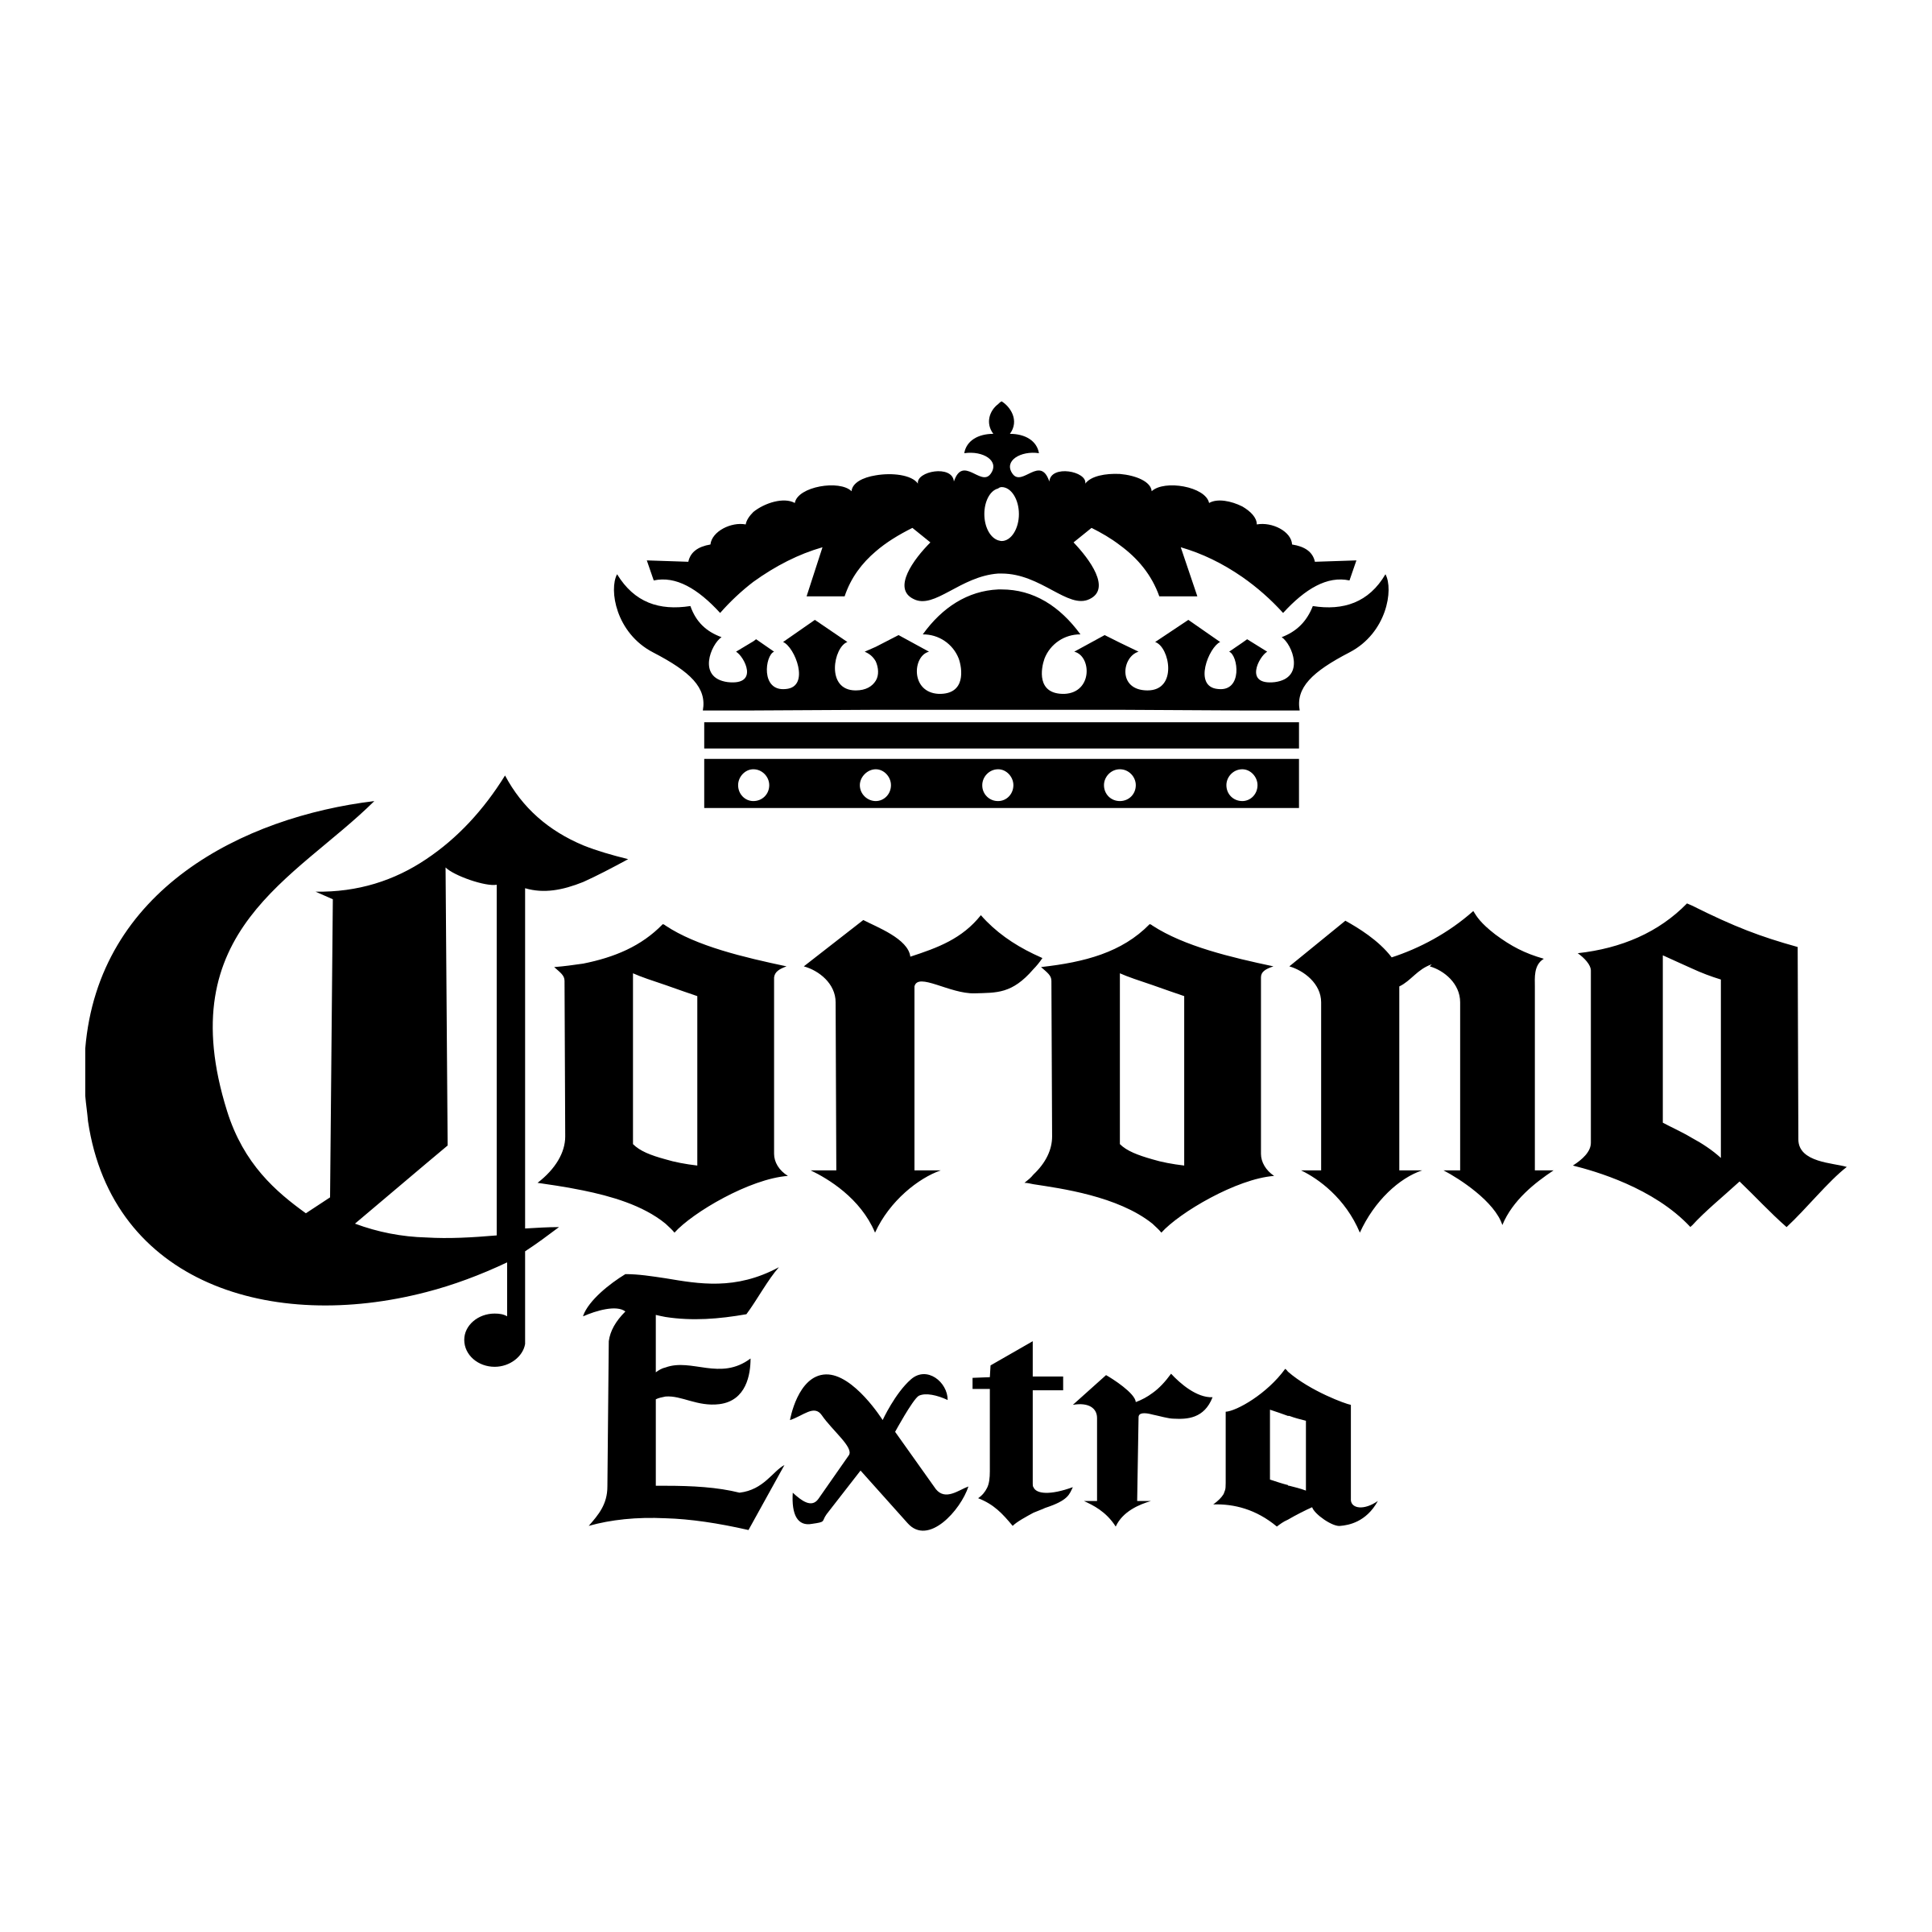 Client - Corona - logo black